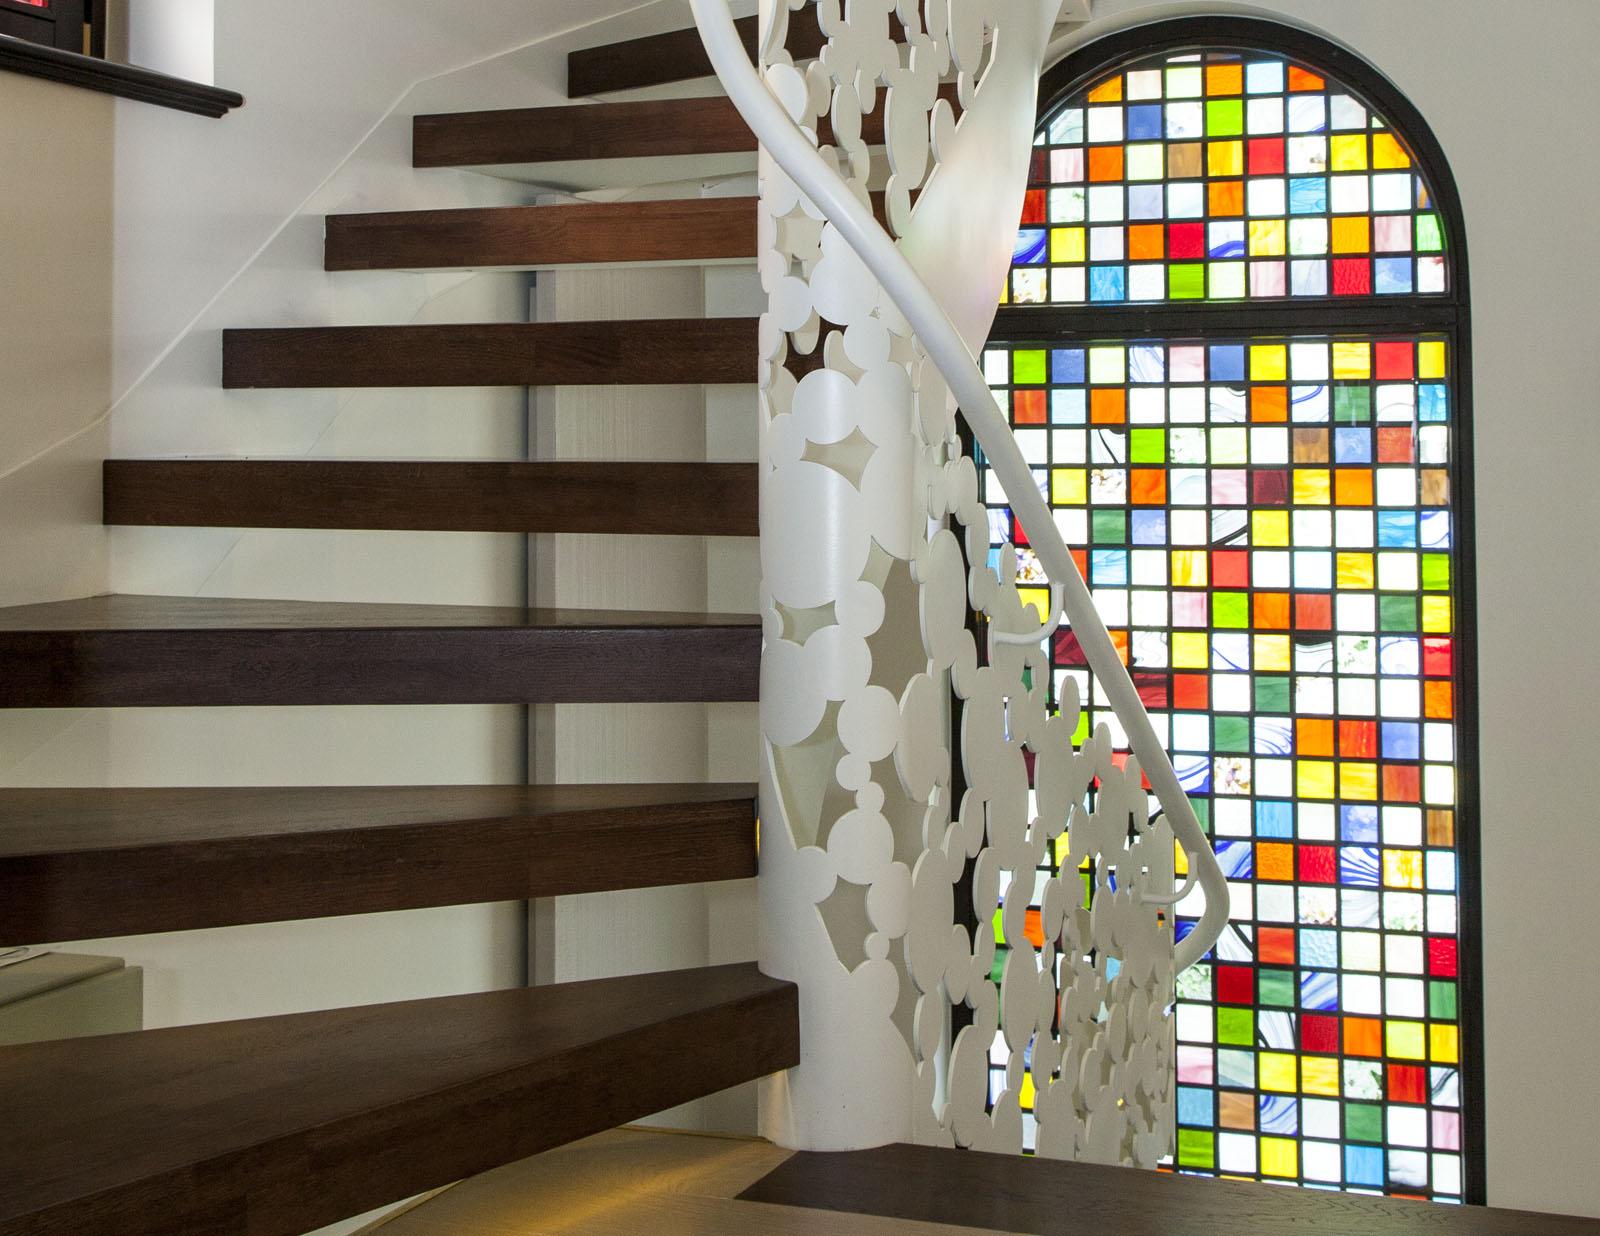 Scara lemn structura metal balustrada debitata laser haute couture